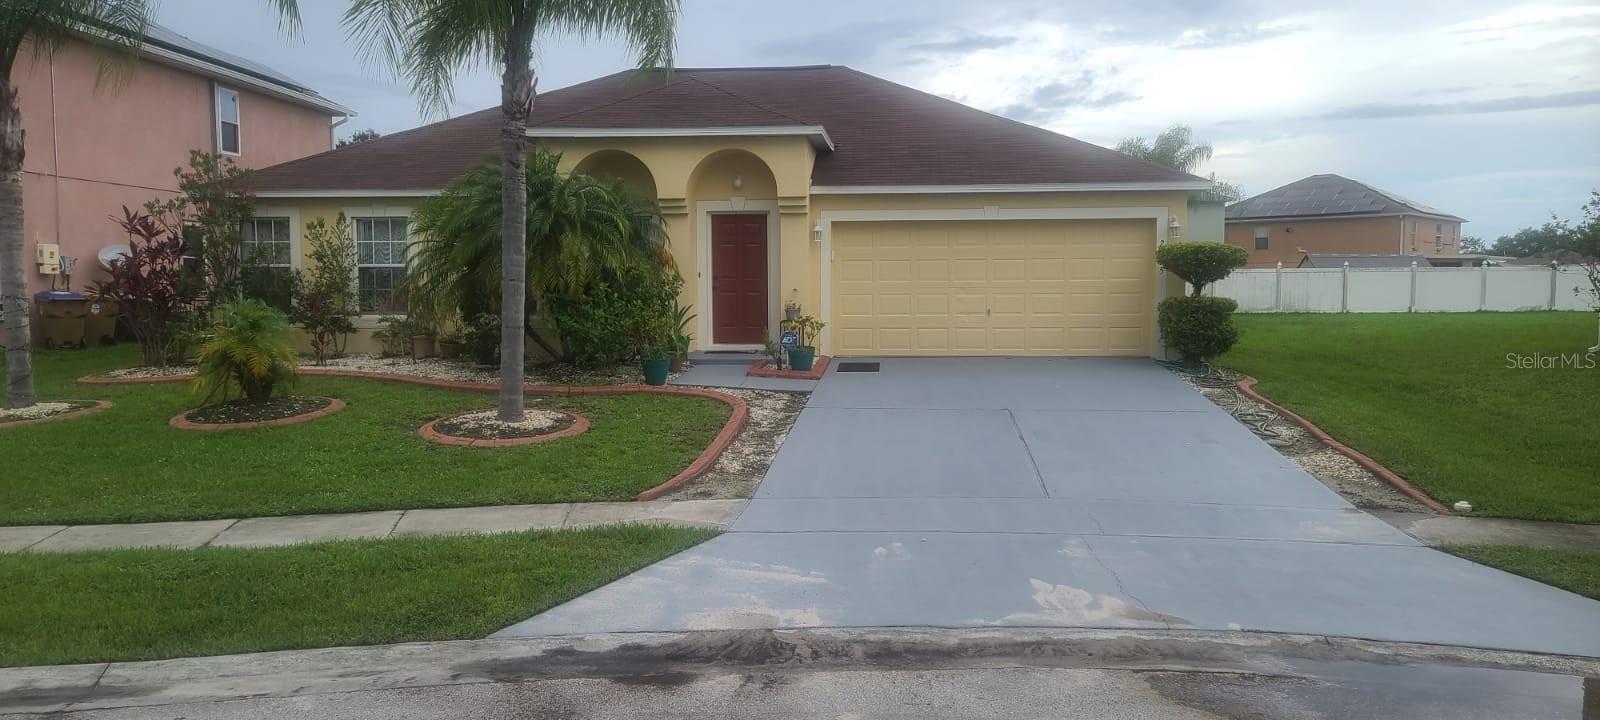 2335 WALNUT CANYON DRIVE, Kissimmee, FL 34758 - #: S5052867